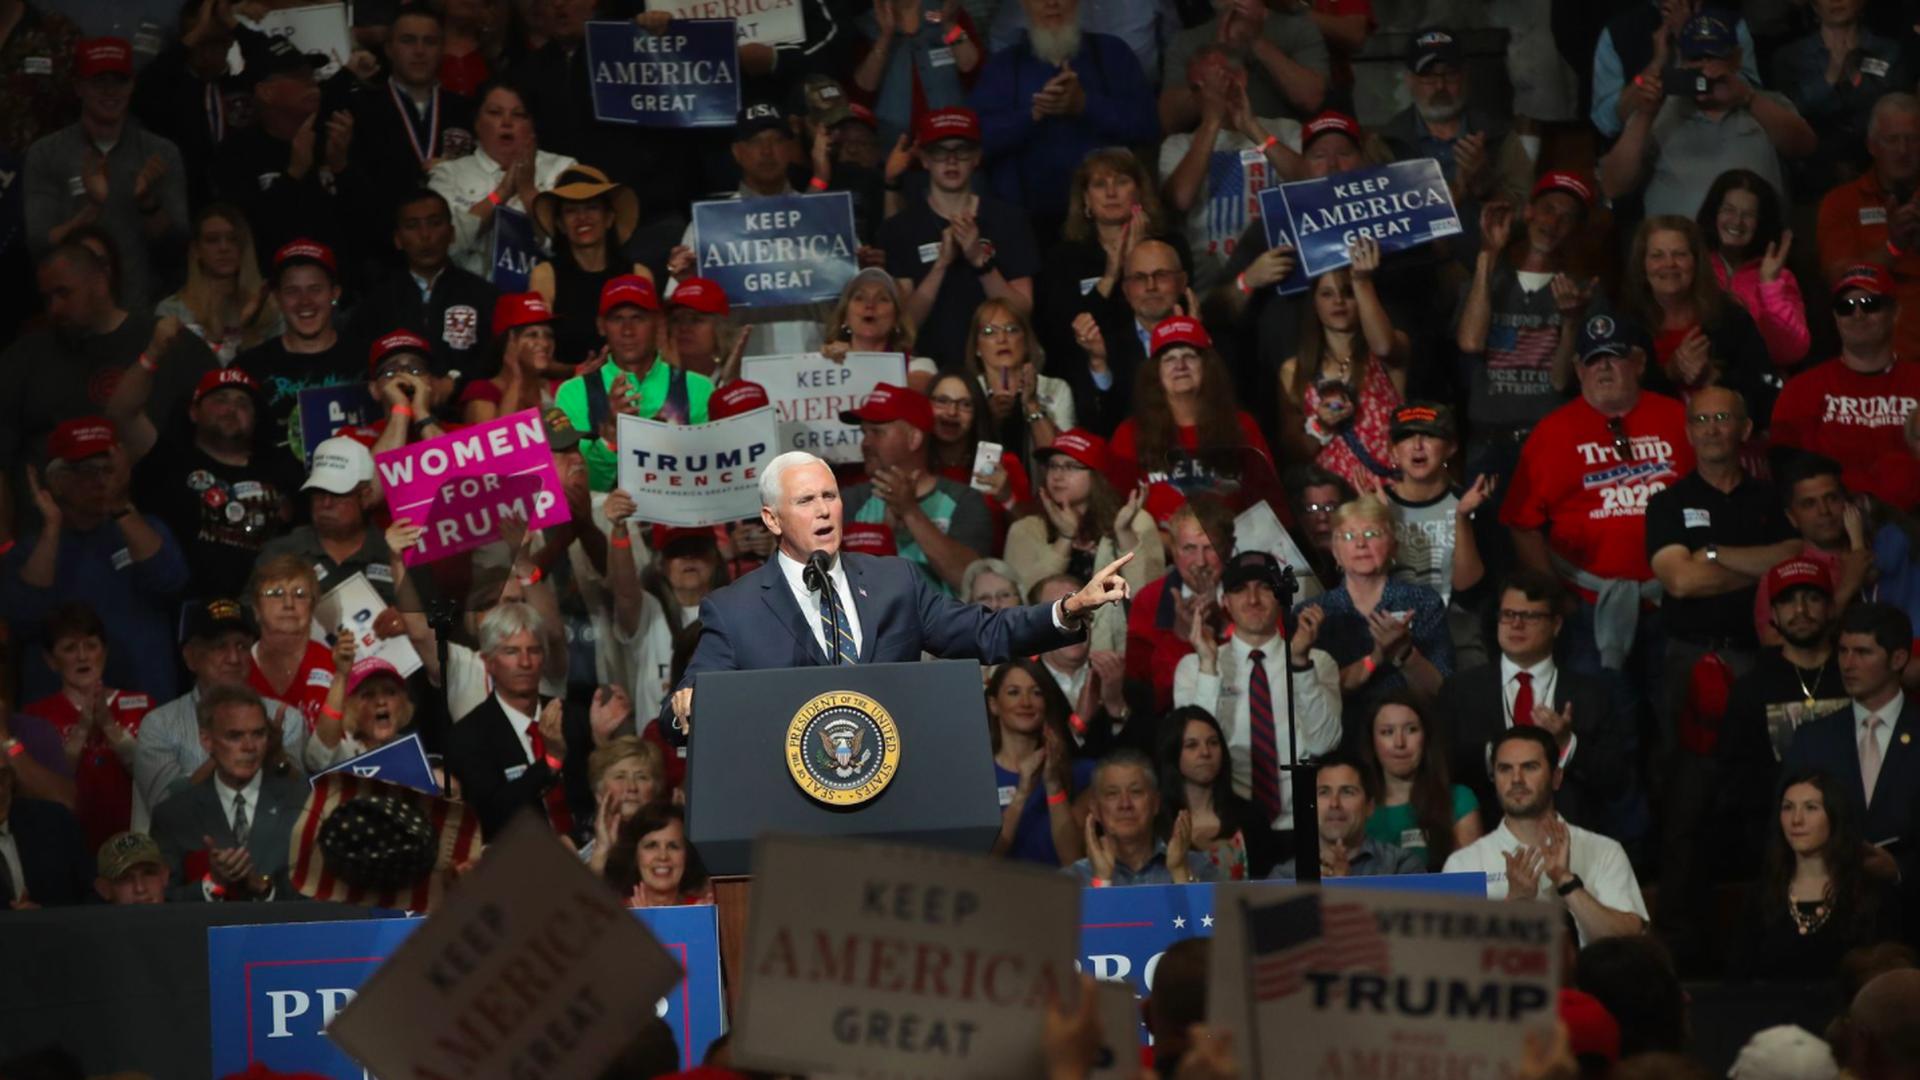 Pence on stage among rally-goers